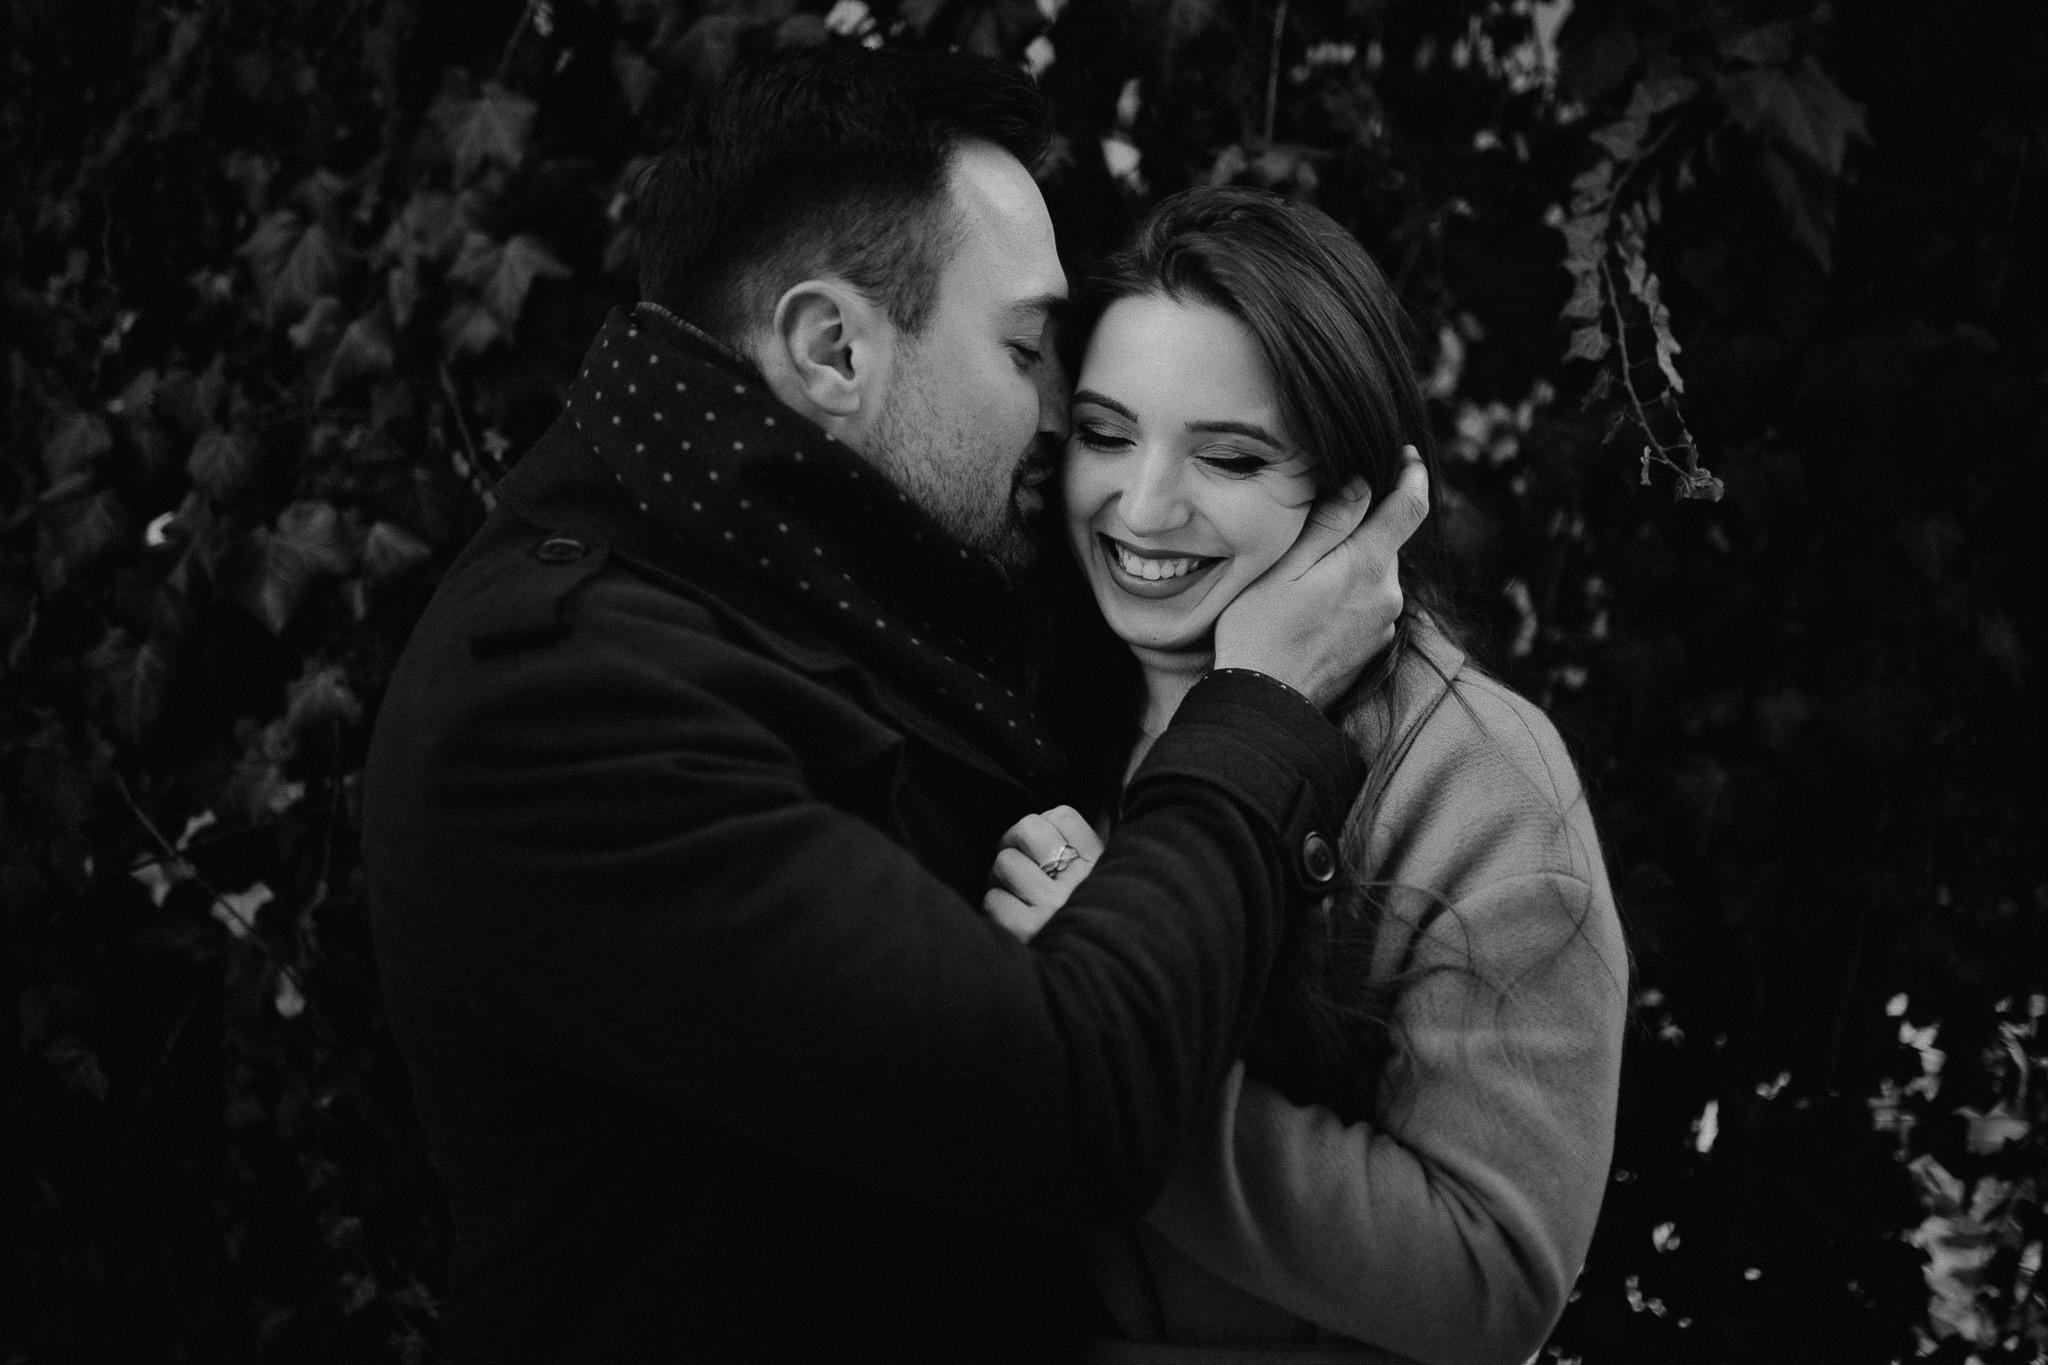 couple-engagement-photoshoot-winter-1.jpg